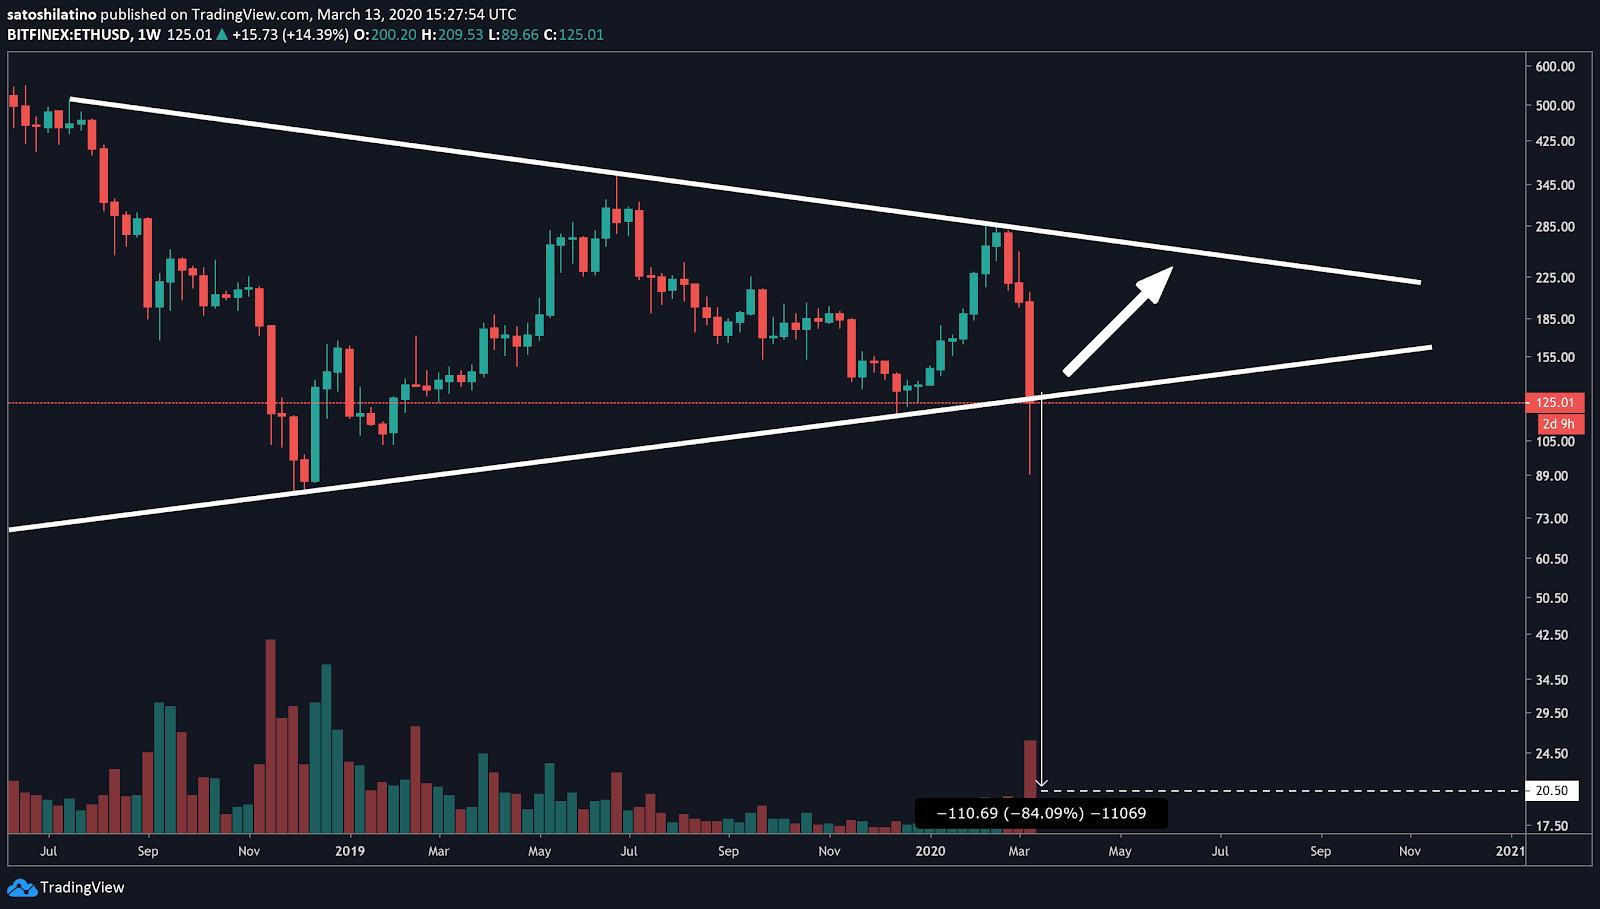 Ethereum / US dollar price chart on TradingView